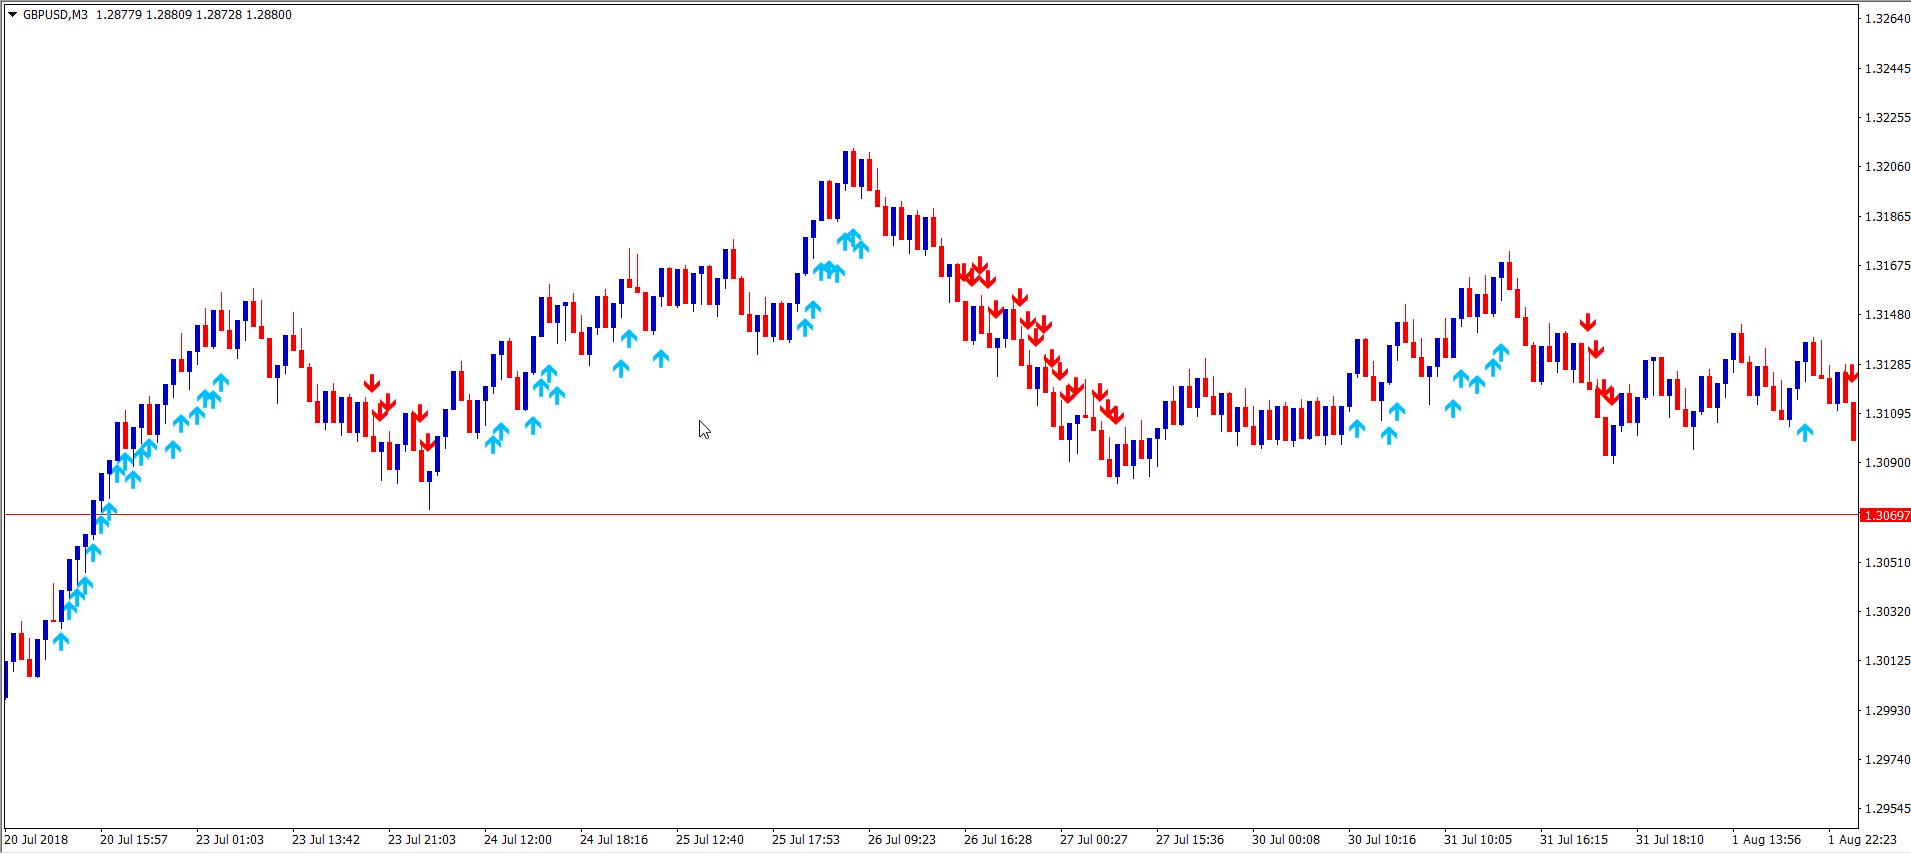 Momentum 4 1 1 Indicator — Exact Trading - Forex Price